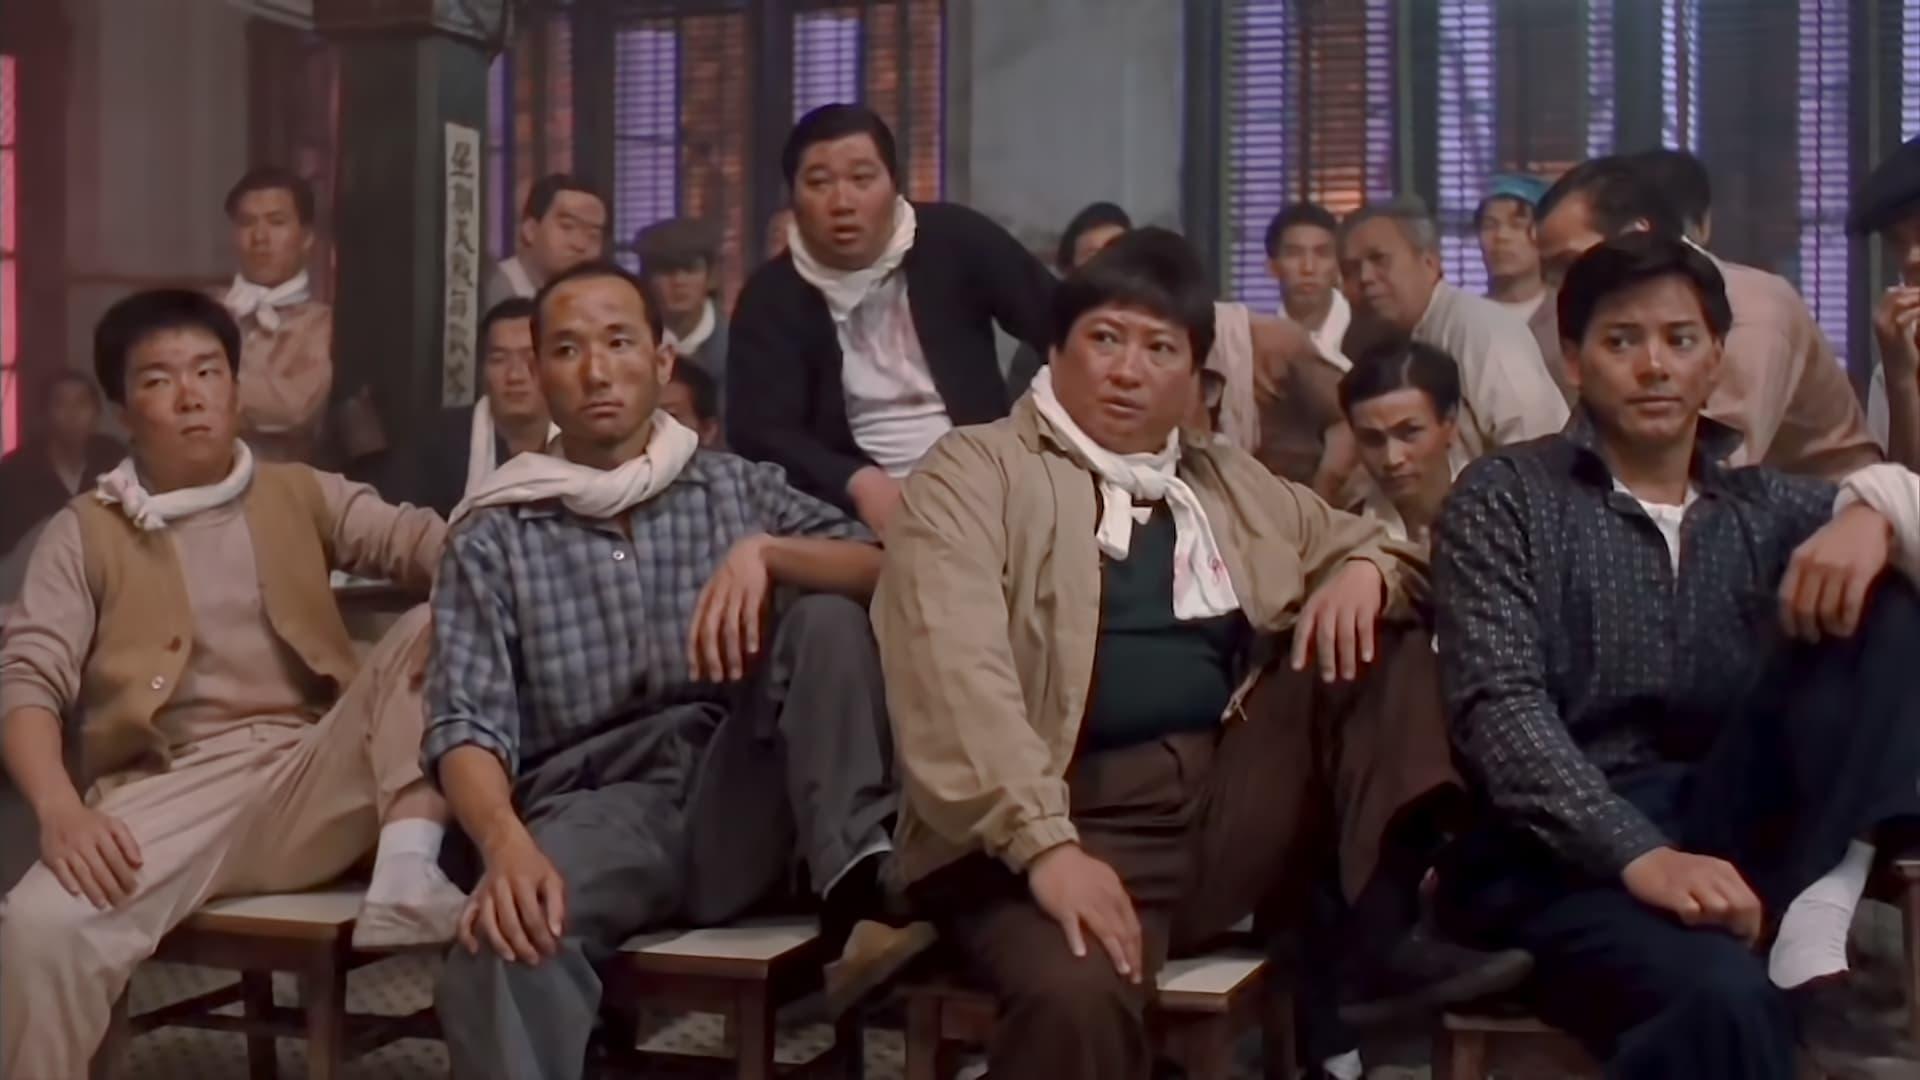 Pedicab Driver (1989) Review - The Action Elite